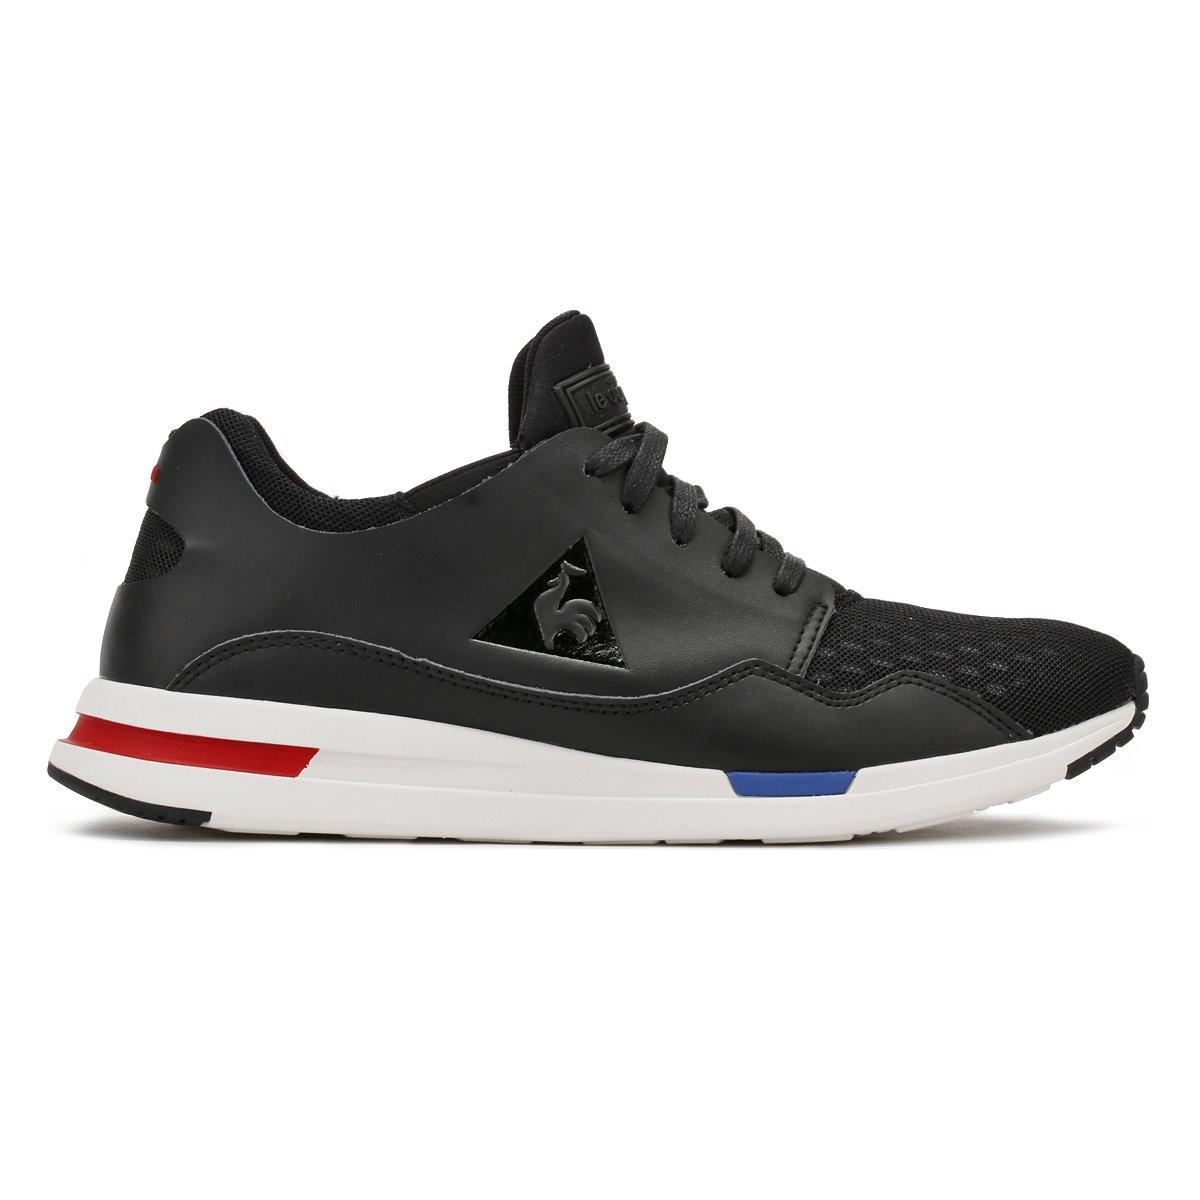 6c20389780a7 Le Coq Sportif Mens Black LCS R Pure Trainers-UK 7  Amazon.co.uk  Shoes    Bags